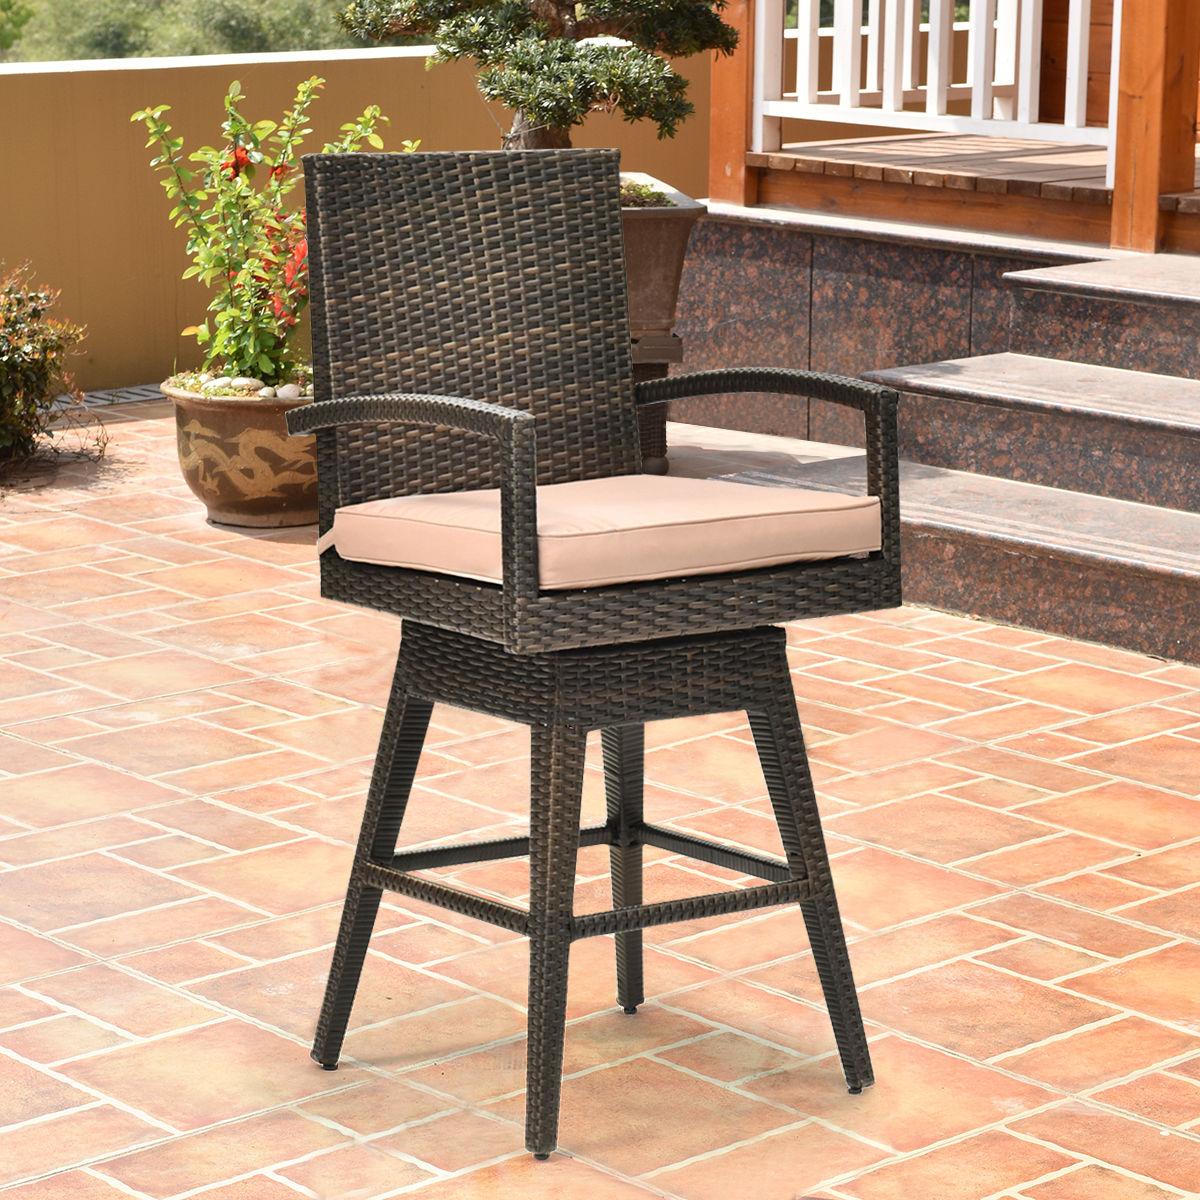 Costway Outdoor Wicker Swivel Bar Stool Chair Patio Backyard Furniture W/ Seat Cushion